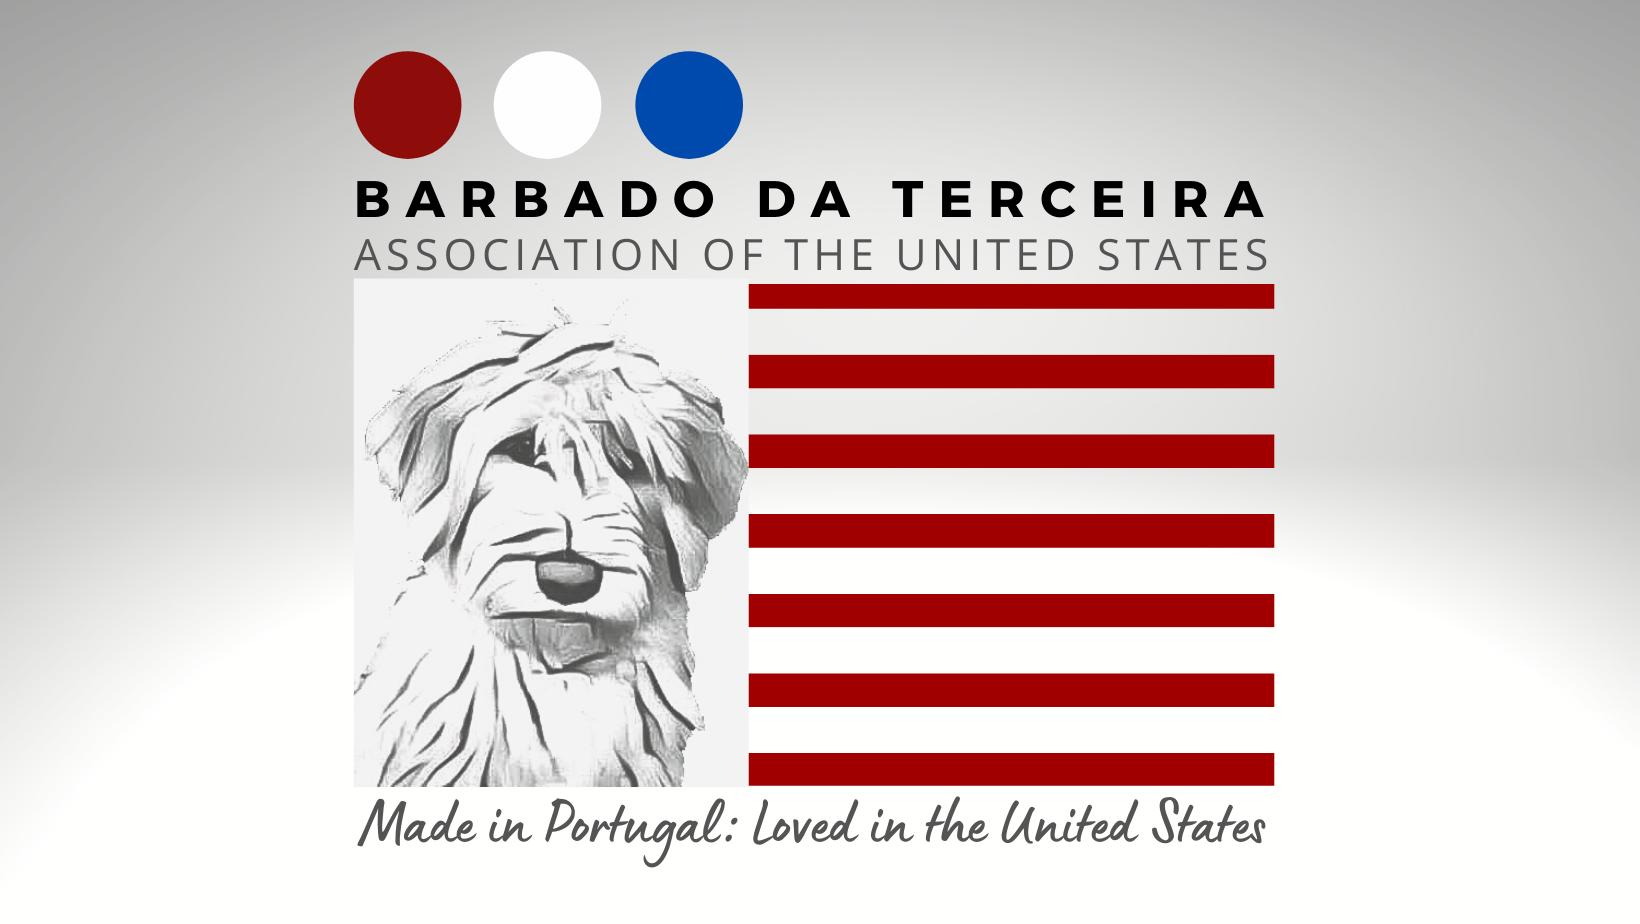 Barbado da Terceira Club of the United States